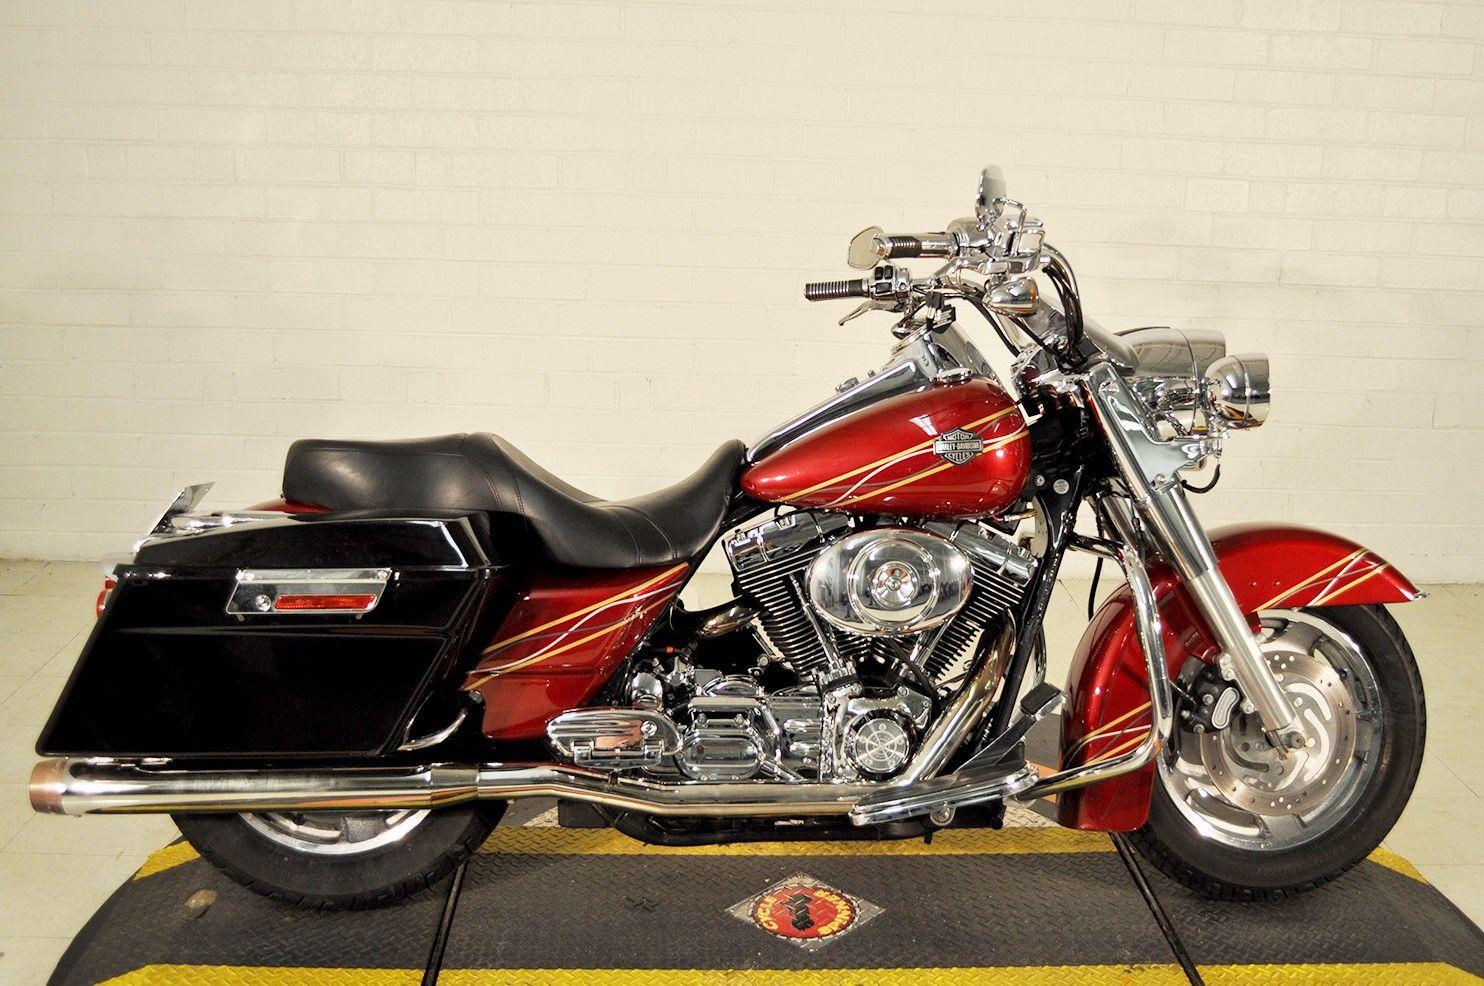 Pre Owned 2004 Harley Davidson Road King Custom In Winston Salem Tn703750 Smokin Harley Davidson